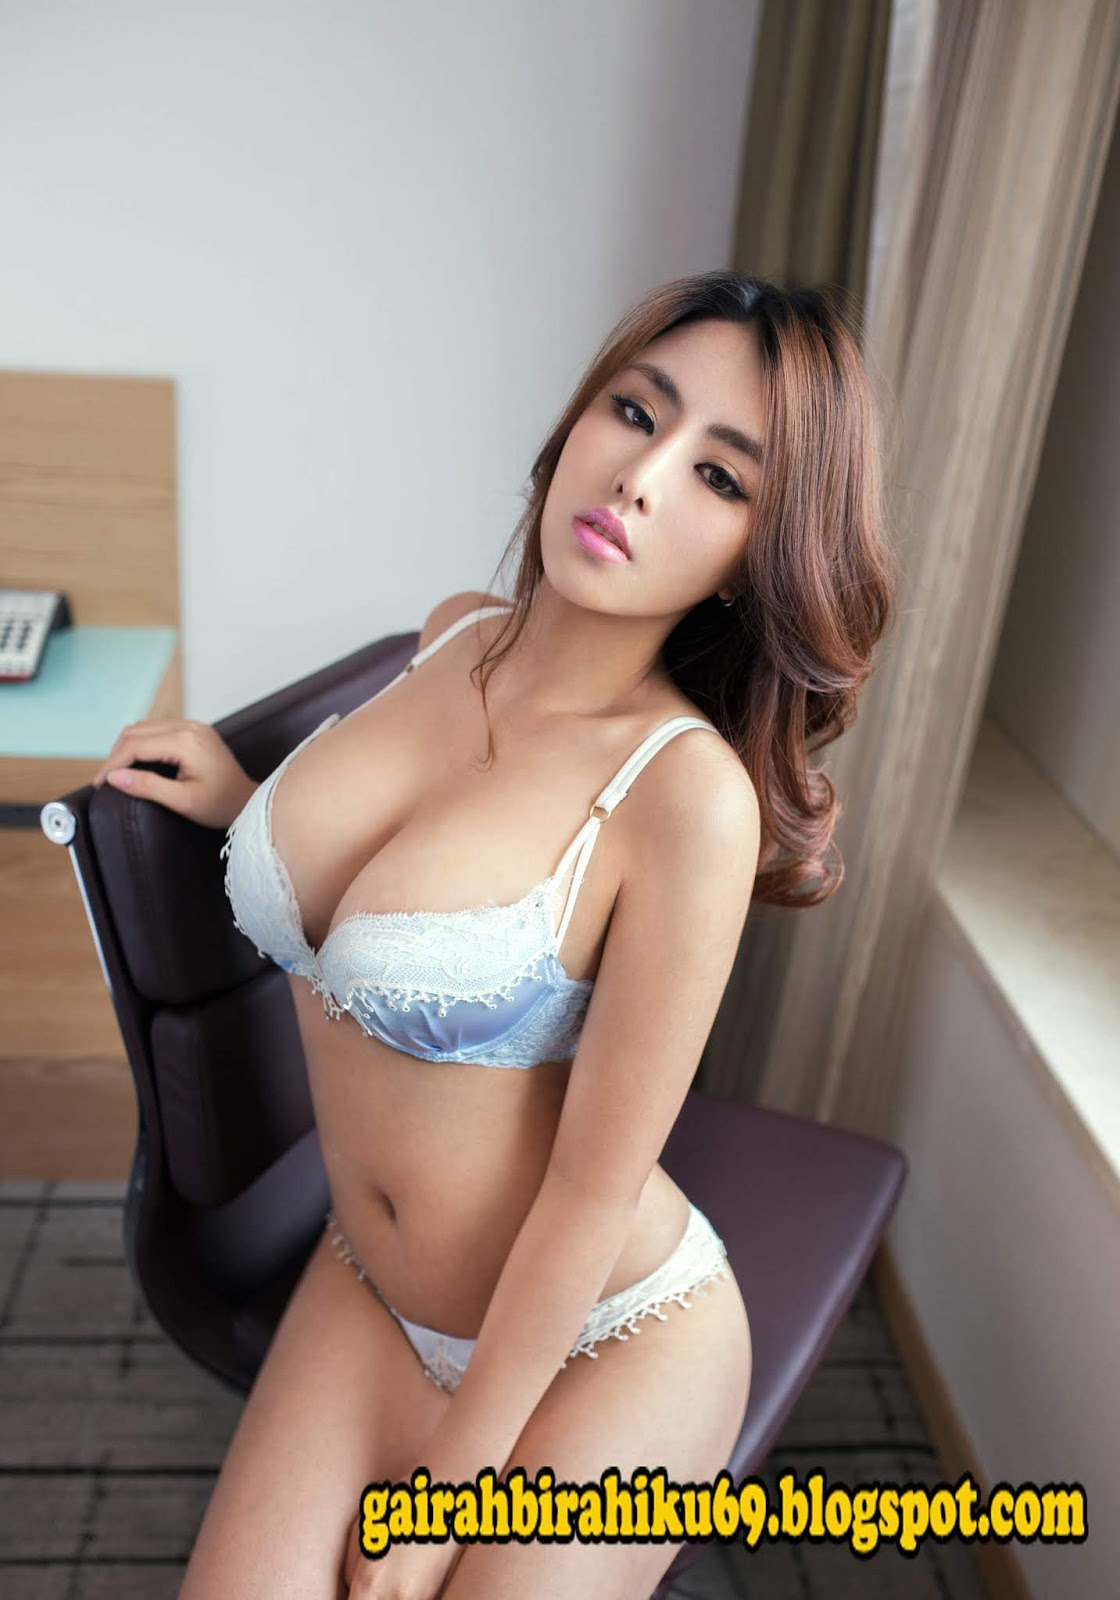 Petite nude asian women